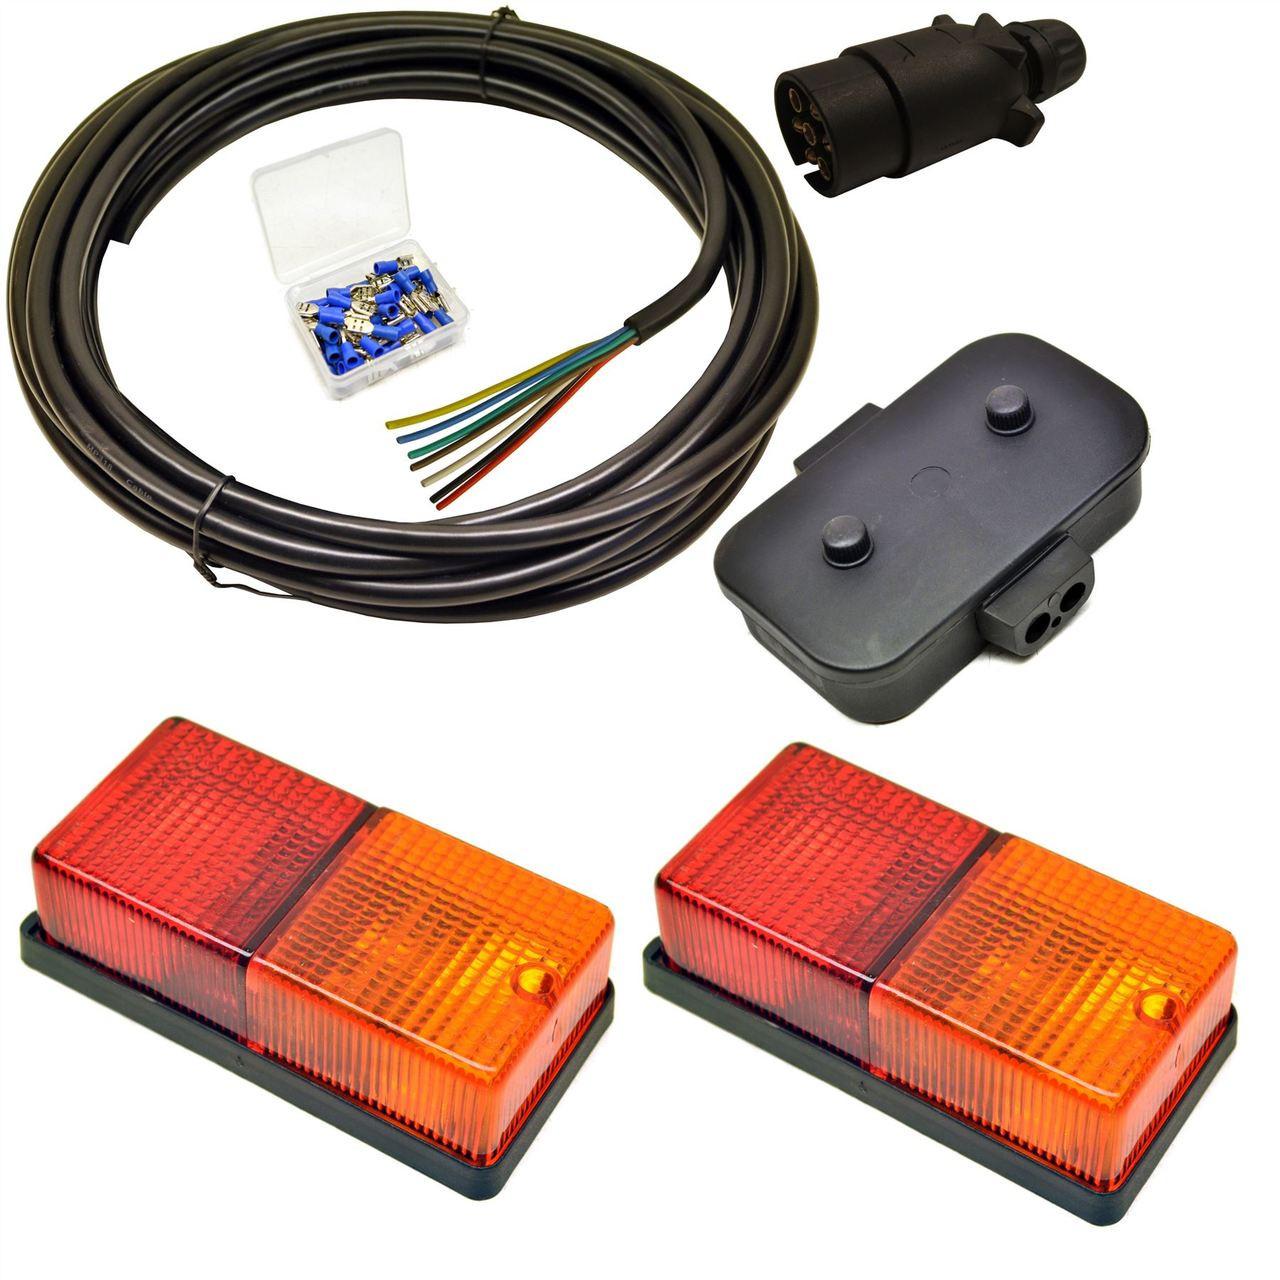 Trailer Light Wiring Kit Medium Lights  Plug  Junction Box  5m Wire  Terminals